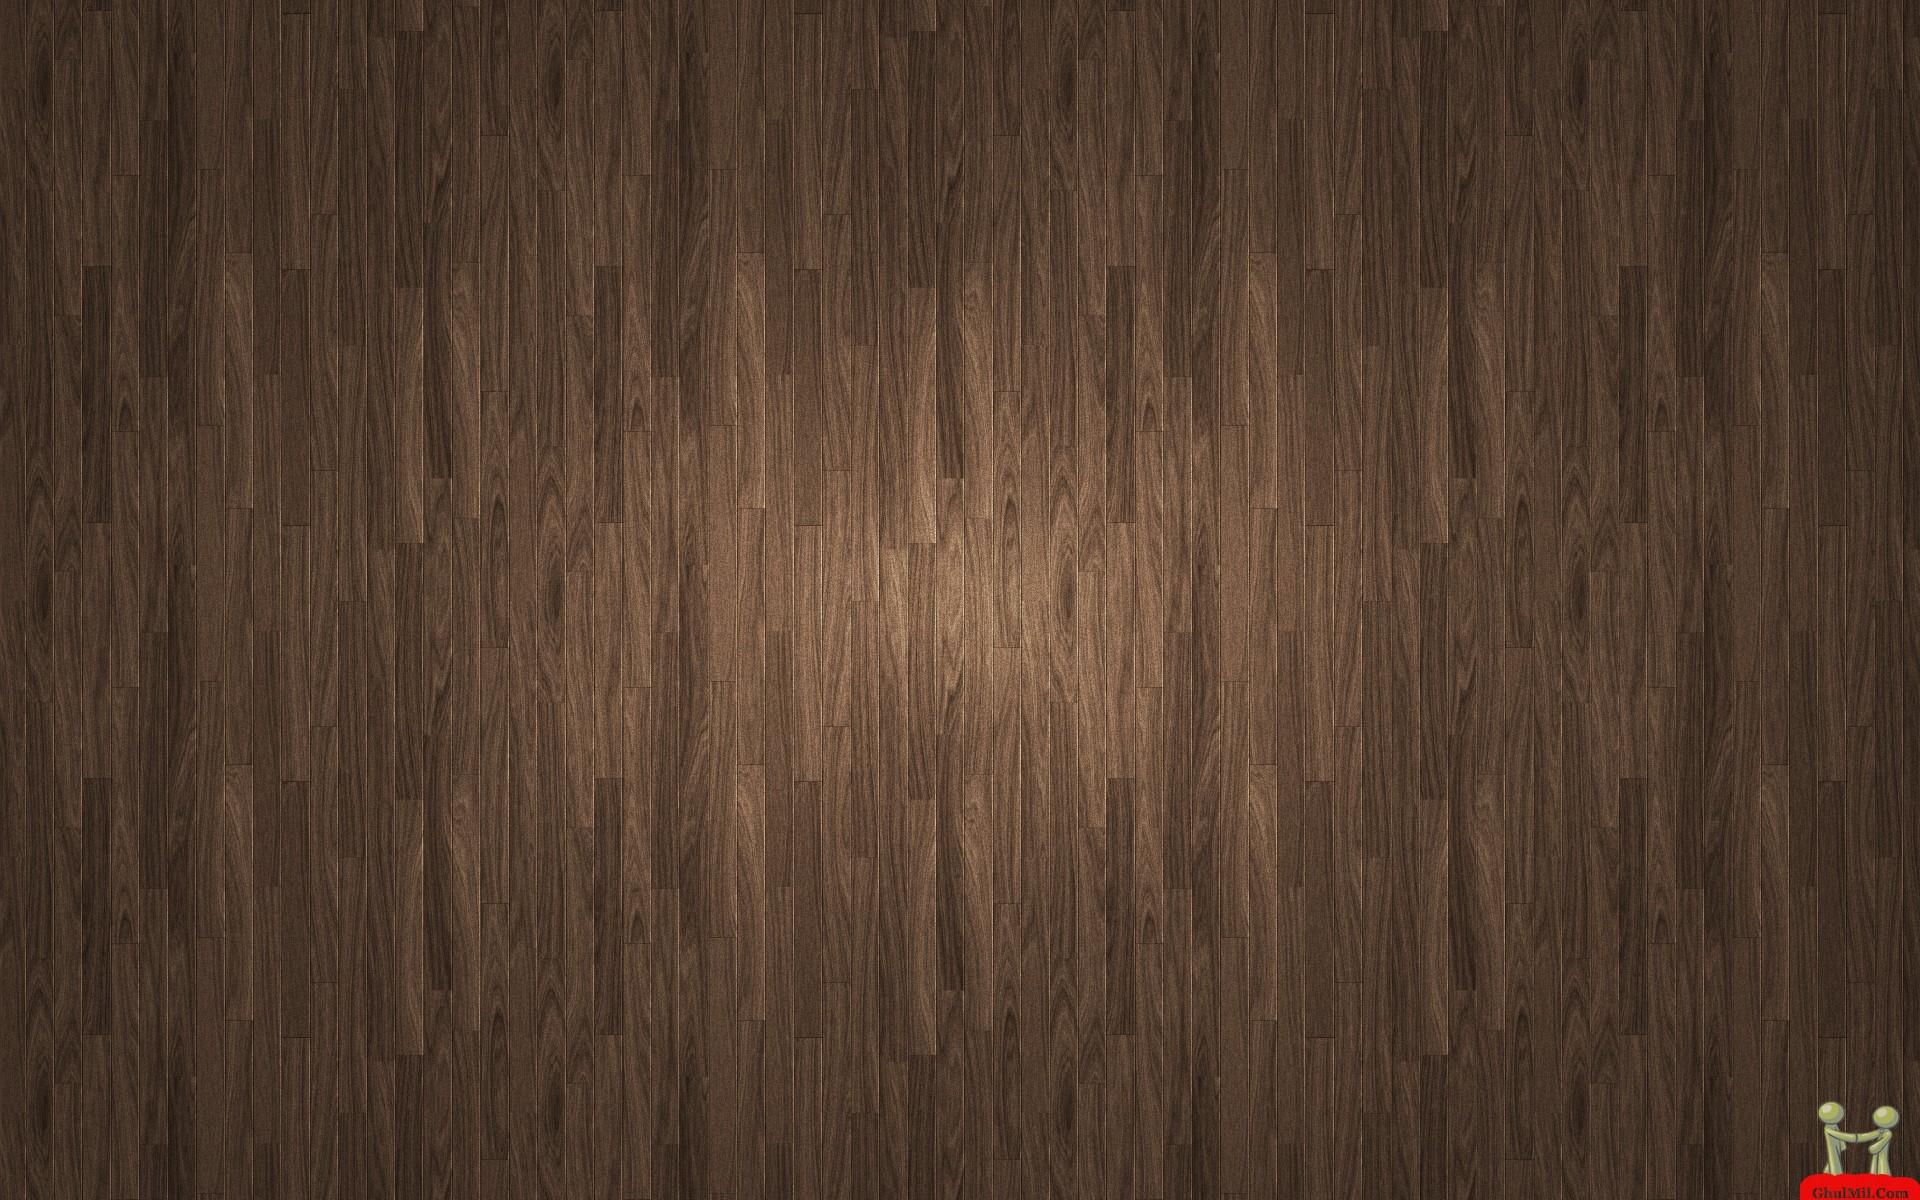 Superb Brown Wood Ply HD Wallpaper E Entertainment 1920x1200